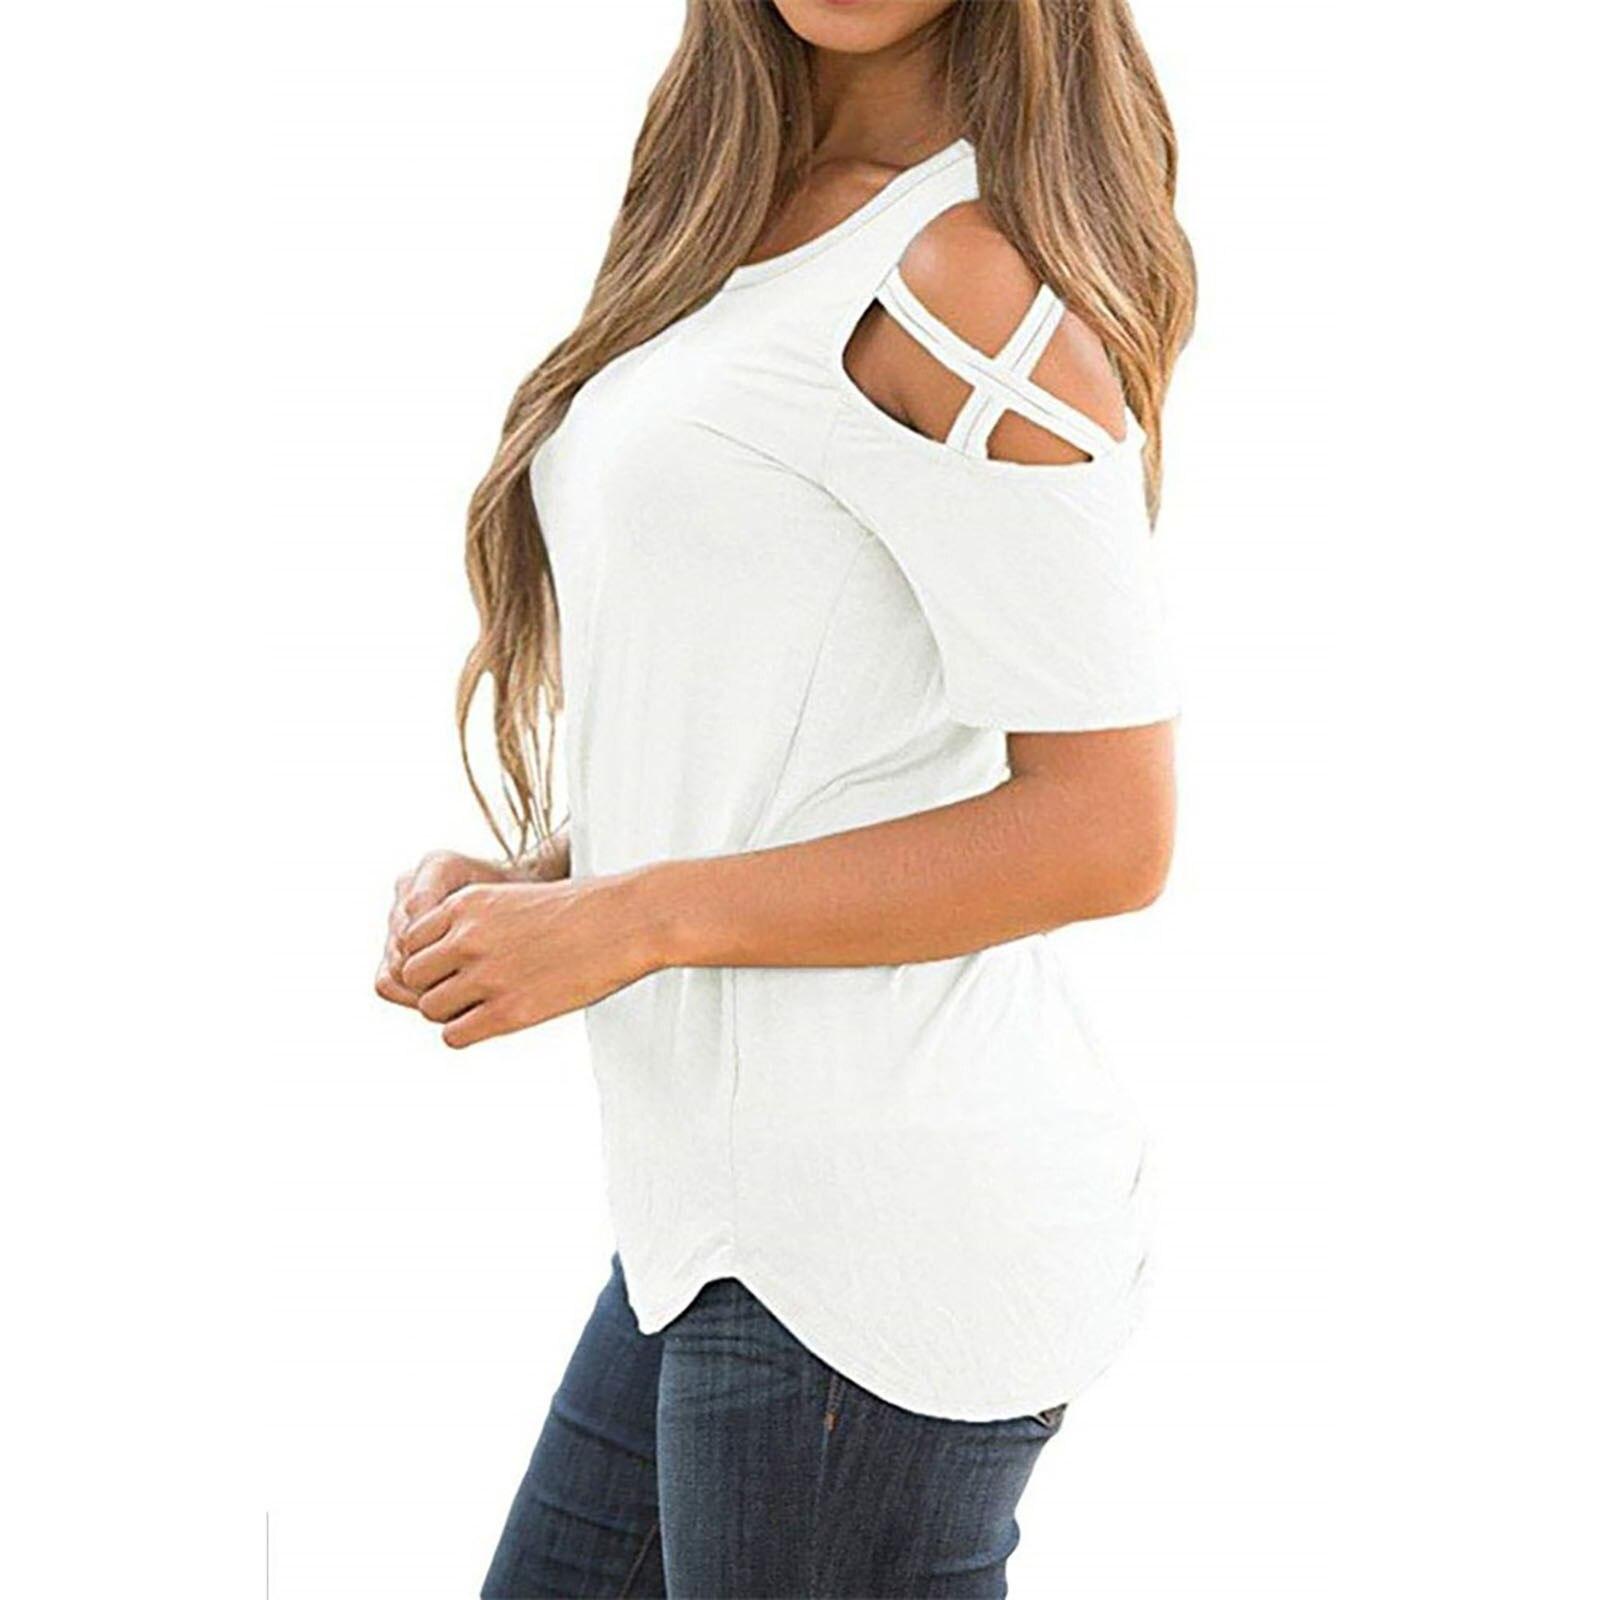 Women's short-sleeved summer women's fashion leopard print lace-up strapless T-shirt loose plus size top футболка женский 40*